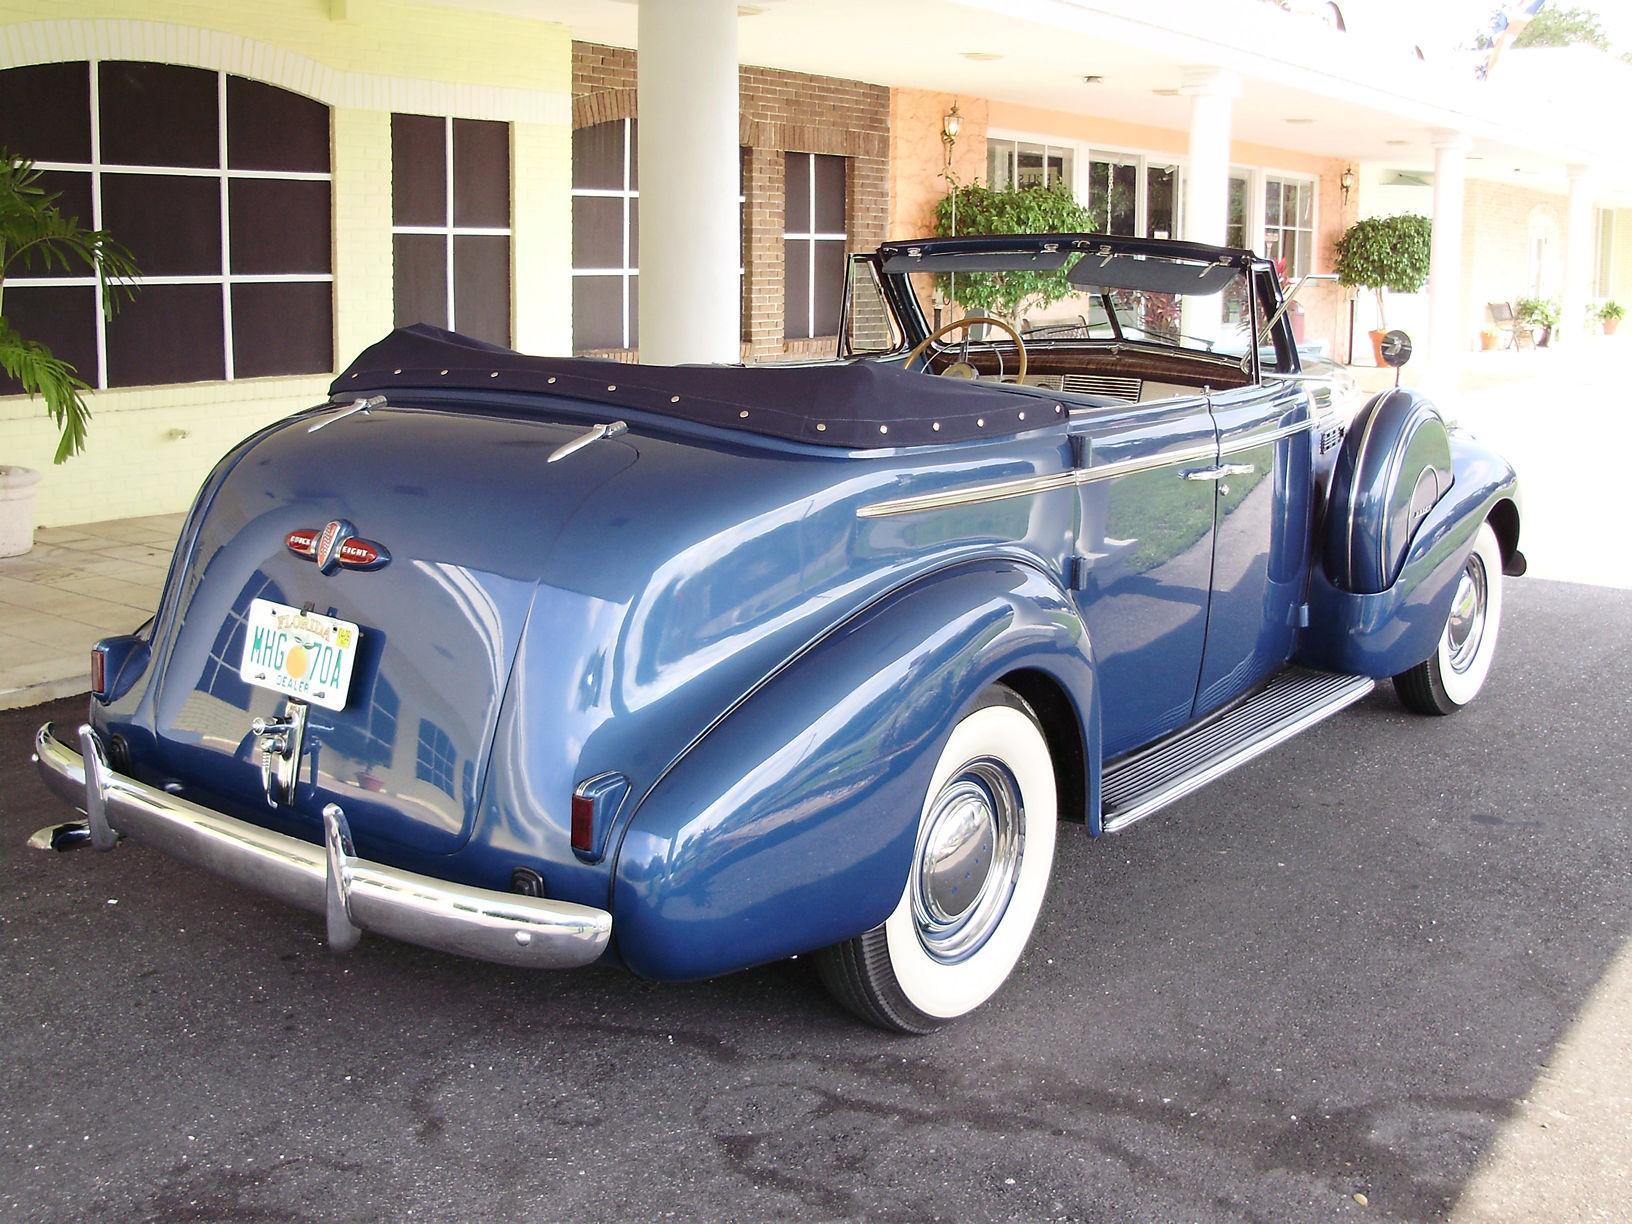 1940 BUICK CENTURY CONVERTIBLE SEDAN - Vintage Motors of Sarasota Inc. #6